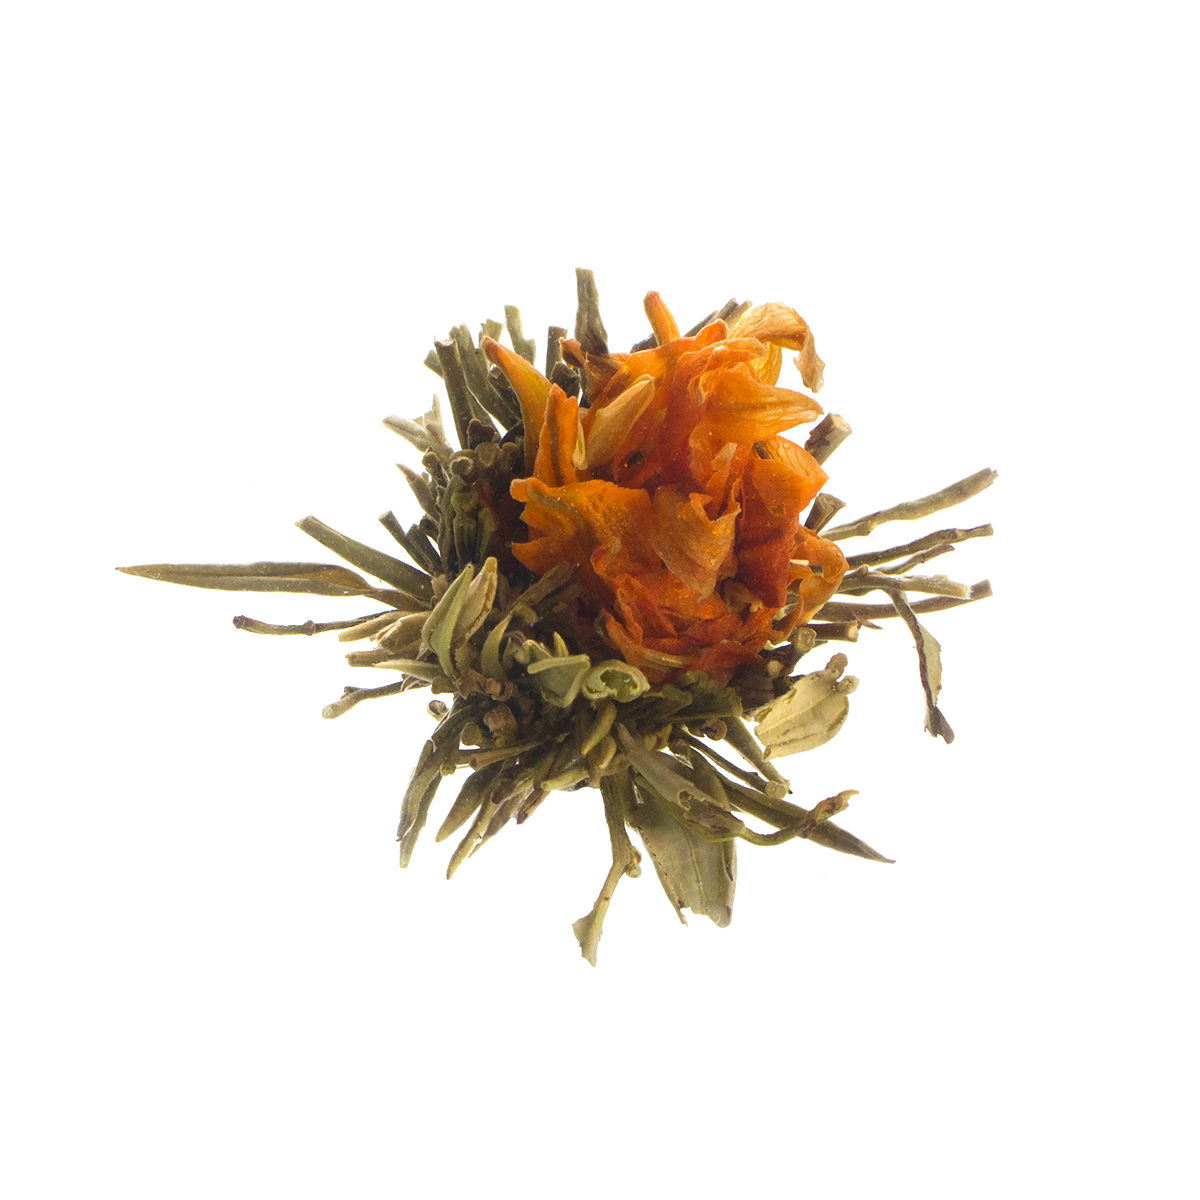 Связанный чай Чханг Е Шанг Гуй (Цветок османтуса), в уп. 5 шт.